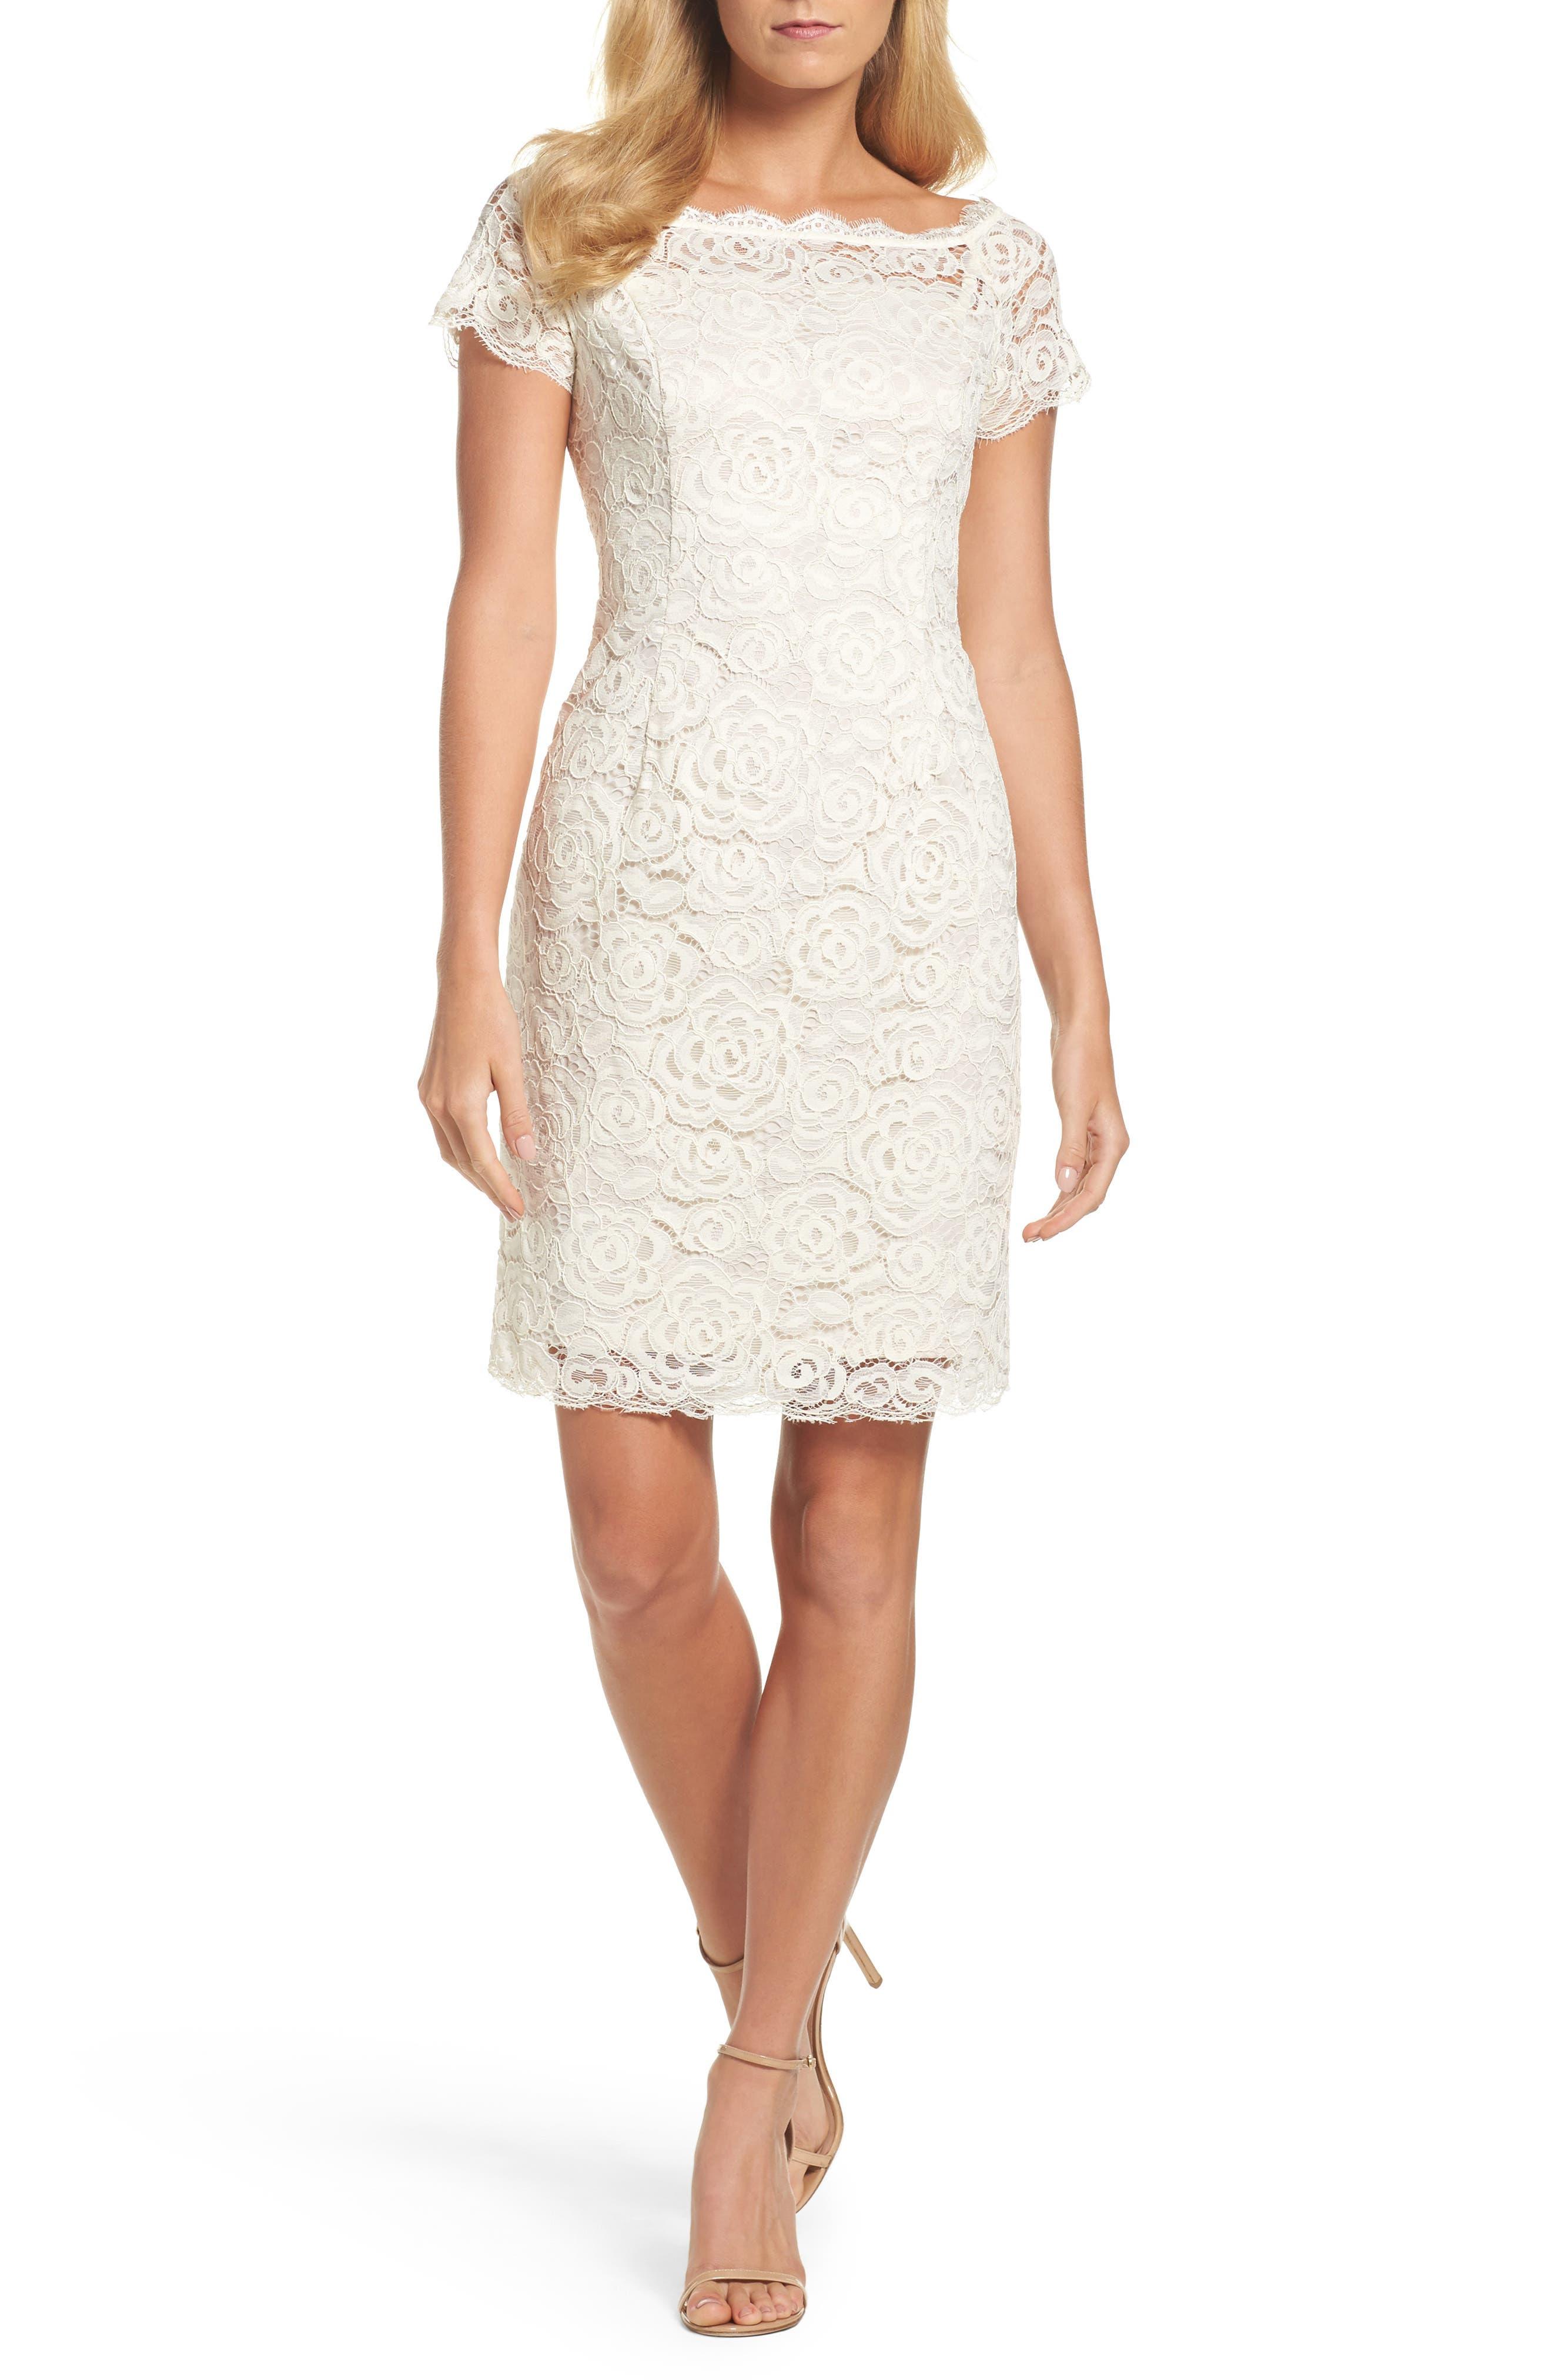 Main Image - Adrianna PapellOff the Shoulder Lace Sheath Dress (Regular & Petite)